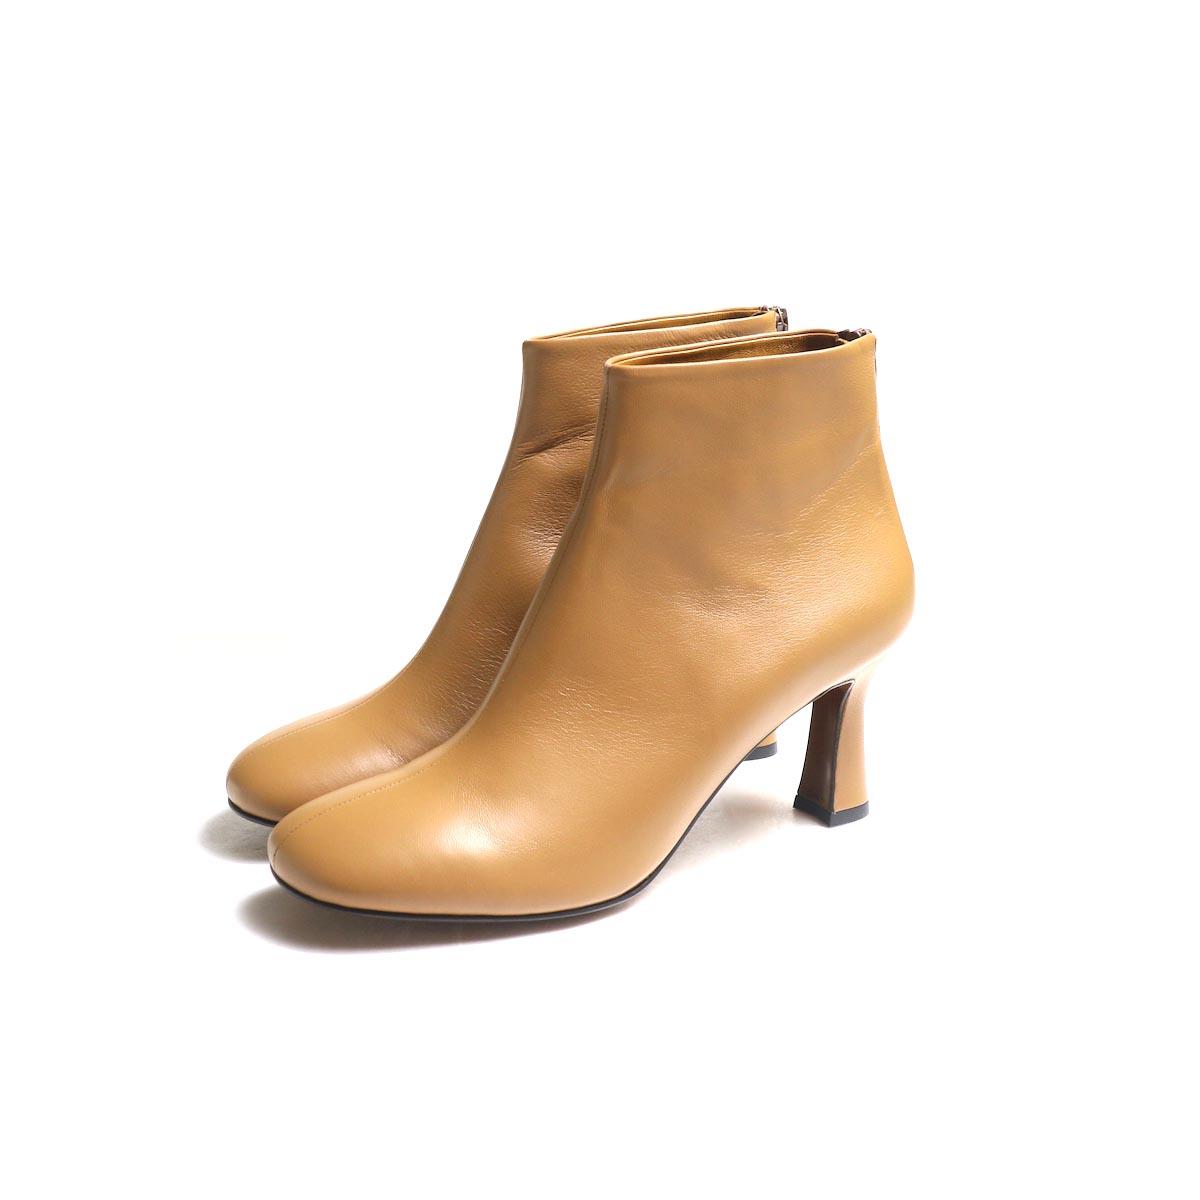 JANE SMITH / SHORT BOOTS -Camel 全体